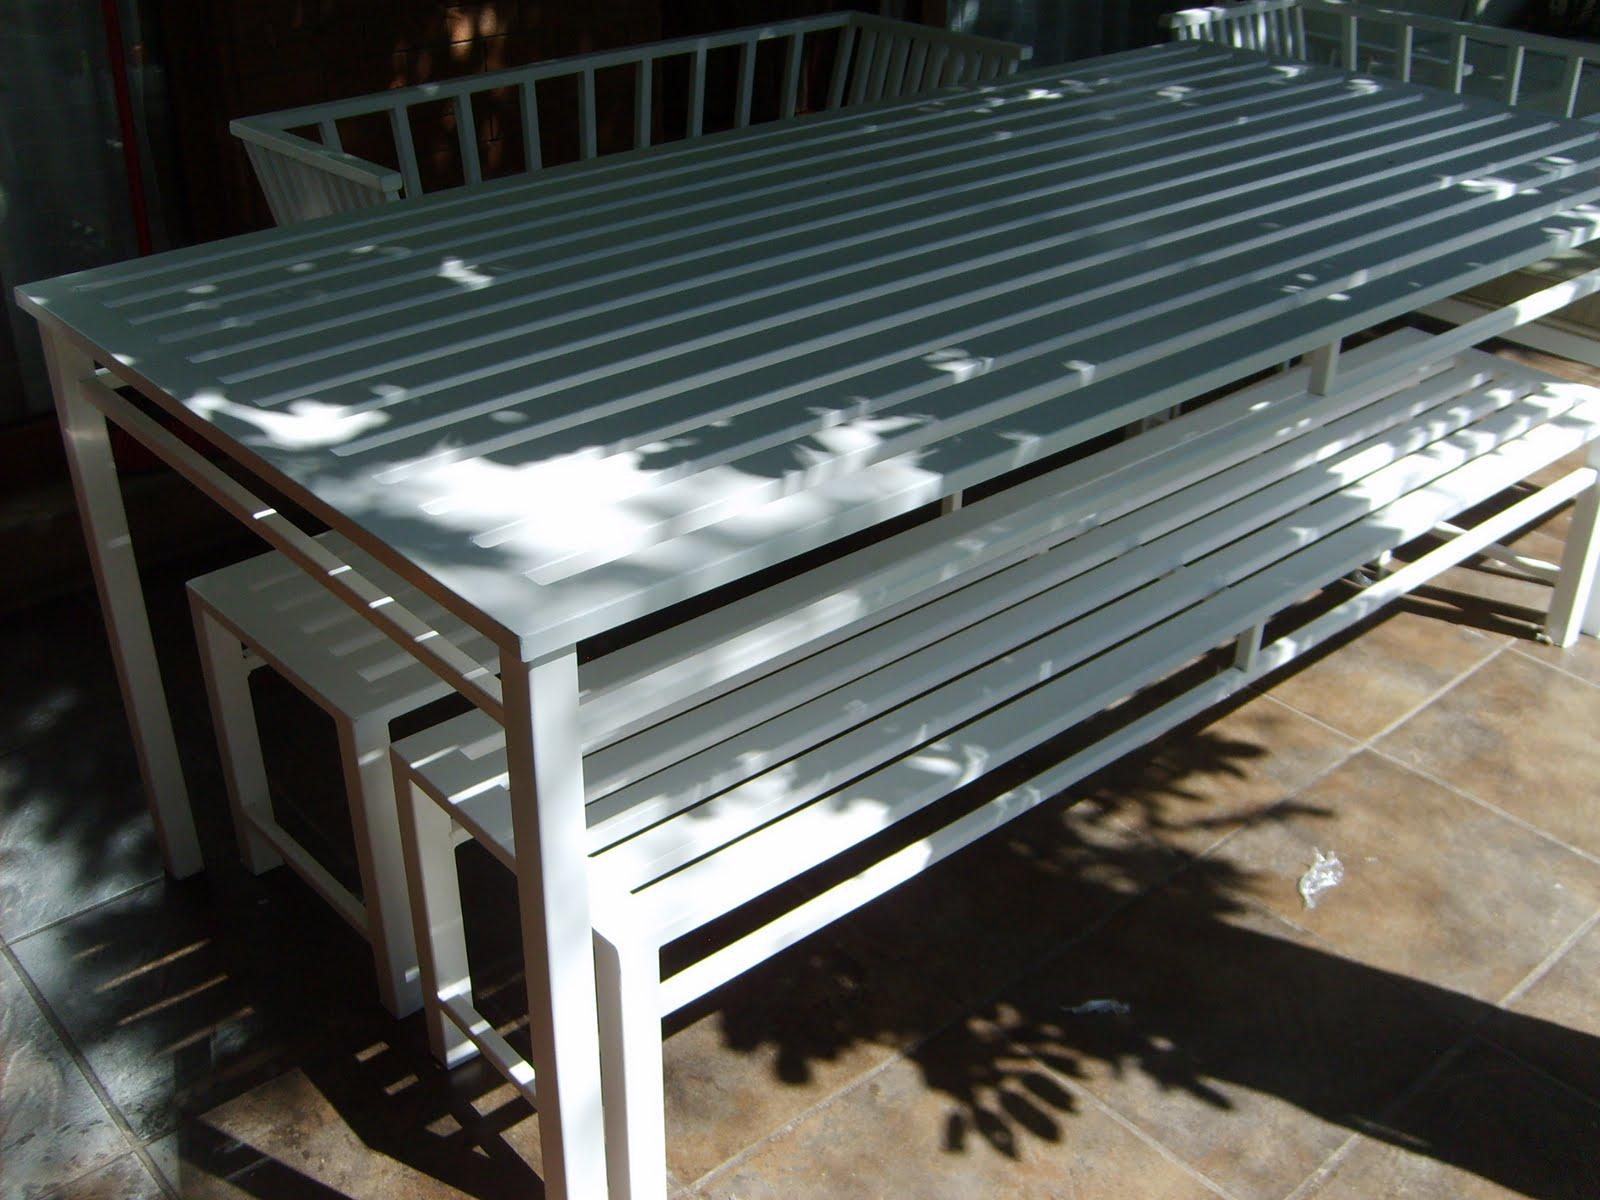 Muebles andrea schoennenbeck for Comedor para terraza